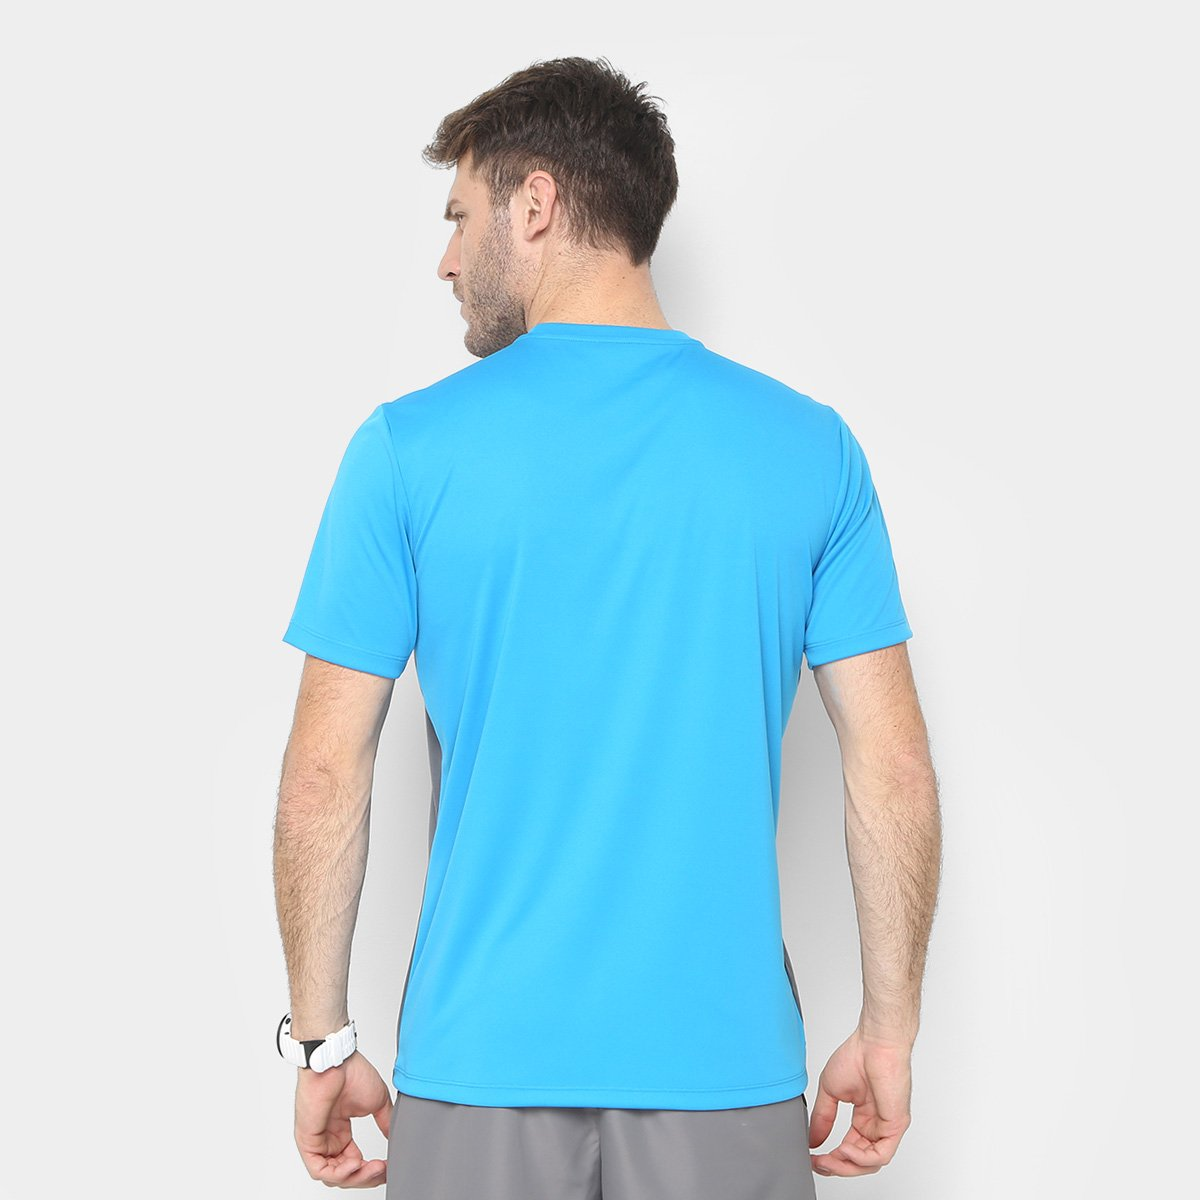 ... Kit Camiseta Avia Bummer + Camiseta Gonew Blocada + Camiseta Gonew  Recorte Masculina ... d69745b3ea639